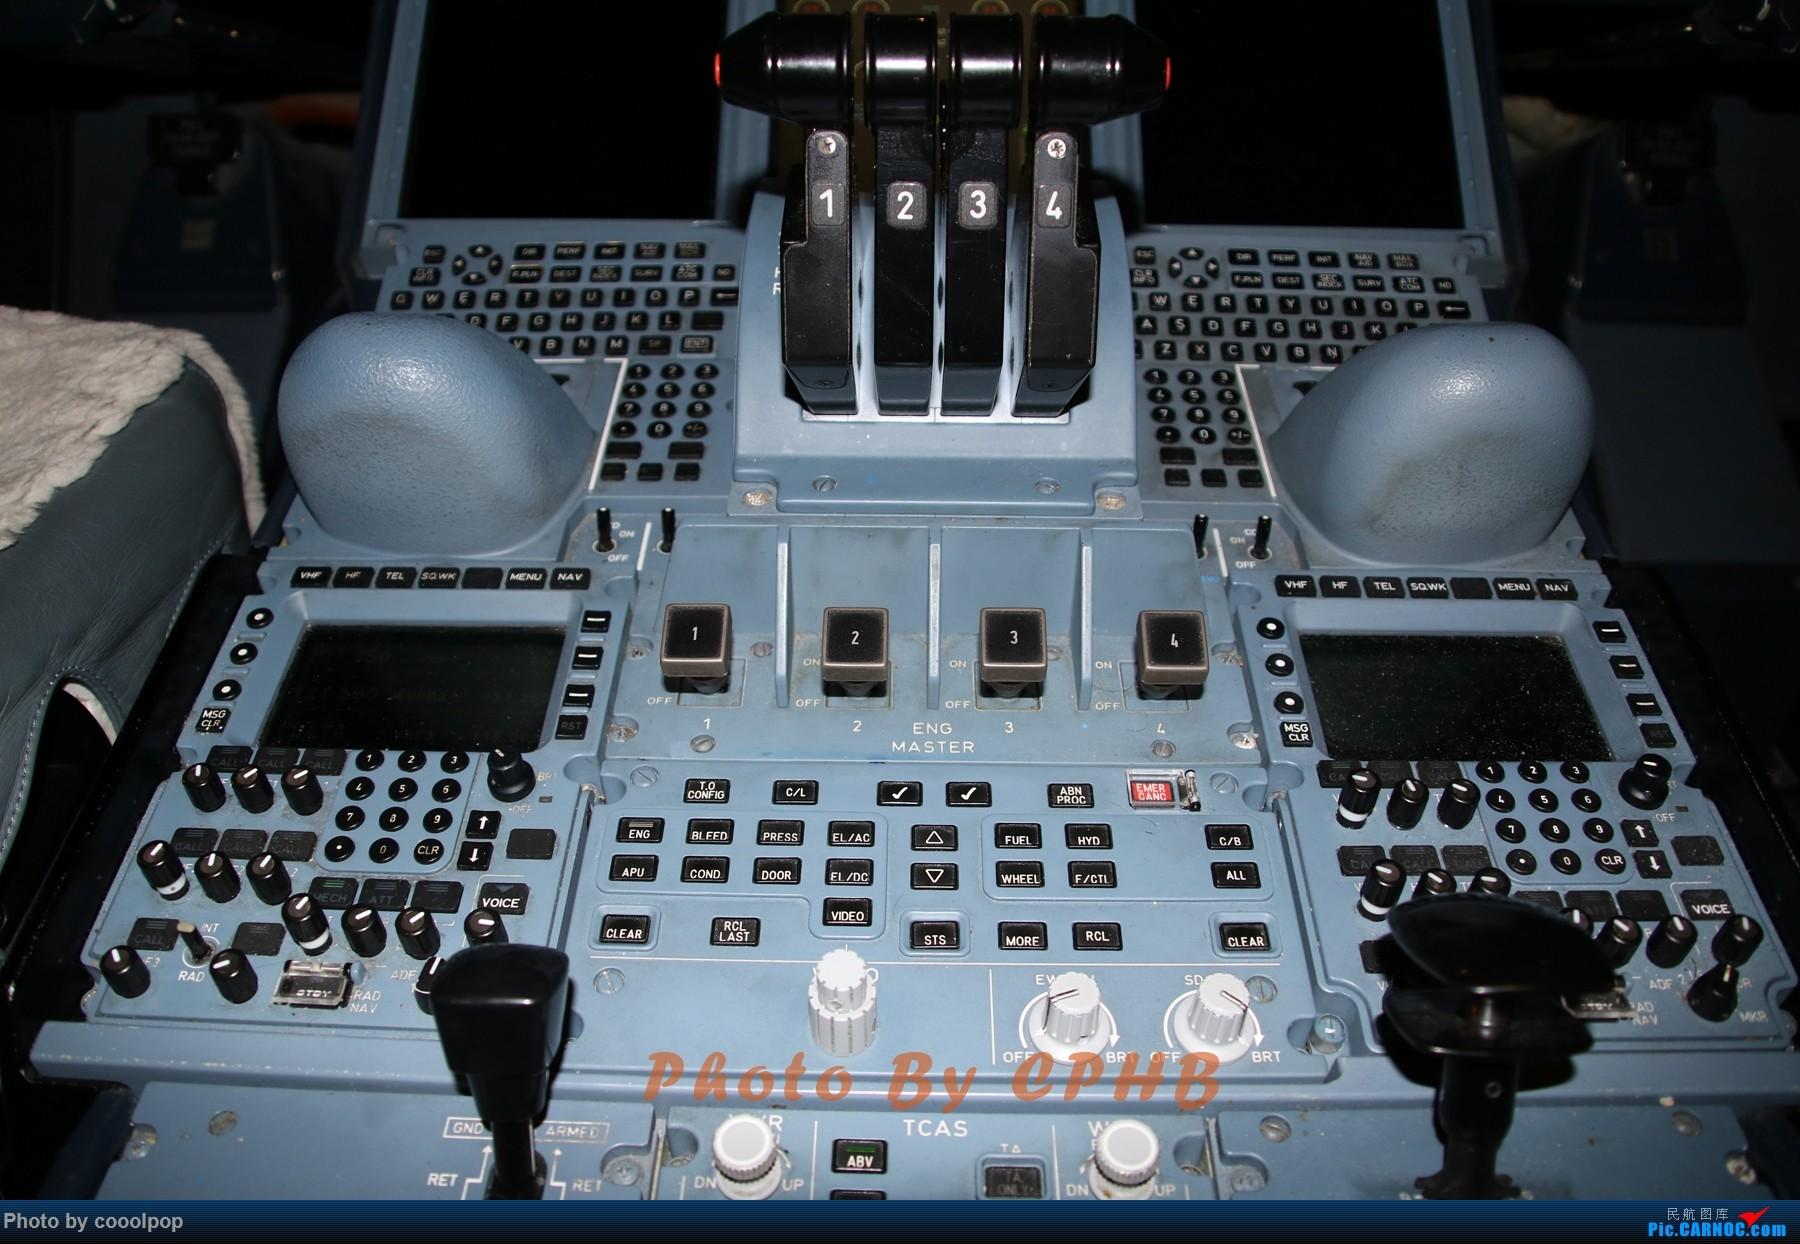 Re:[原创]好些年没来了!发了去年的游记帖子吧 PEK-CDG-VCE-DXB-PEK。法航 阿联酋航空混飞 A380驾驶舱 商务舱 头等舱 外场 A380-800 A6-EEC 中国北京首都国际机场